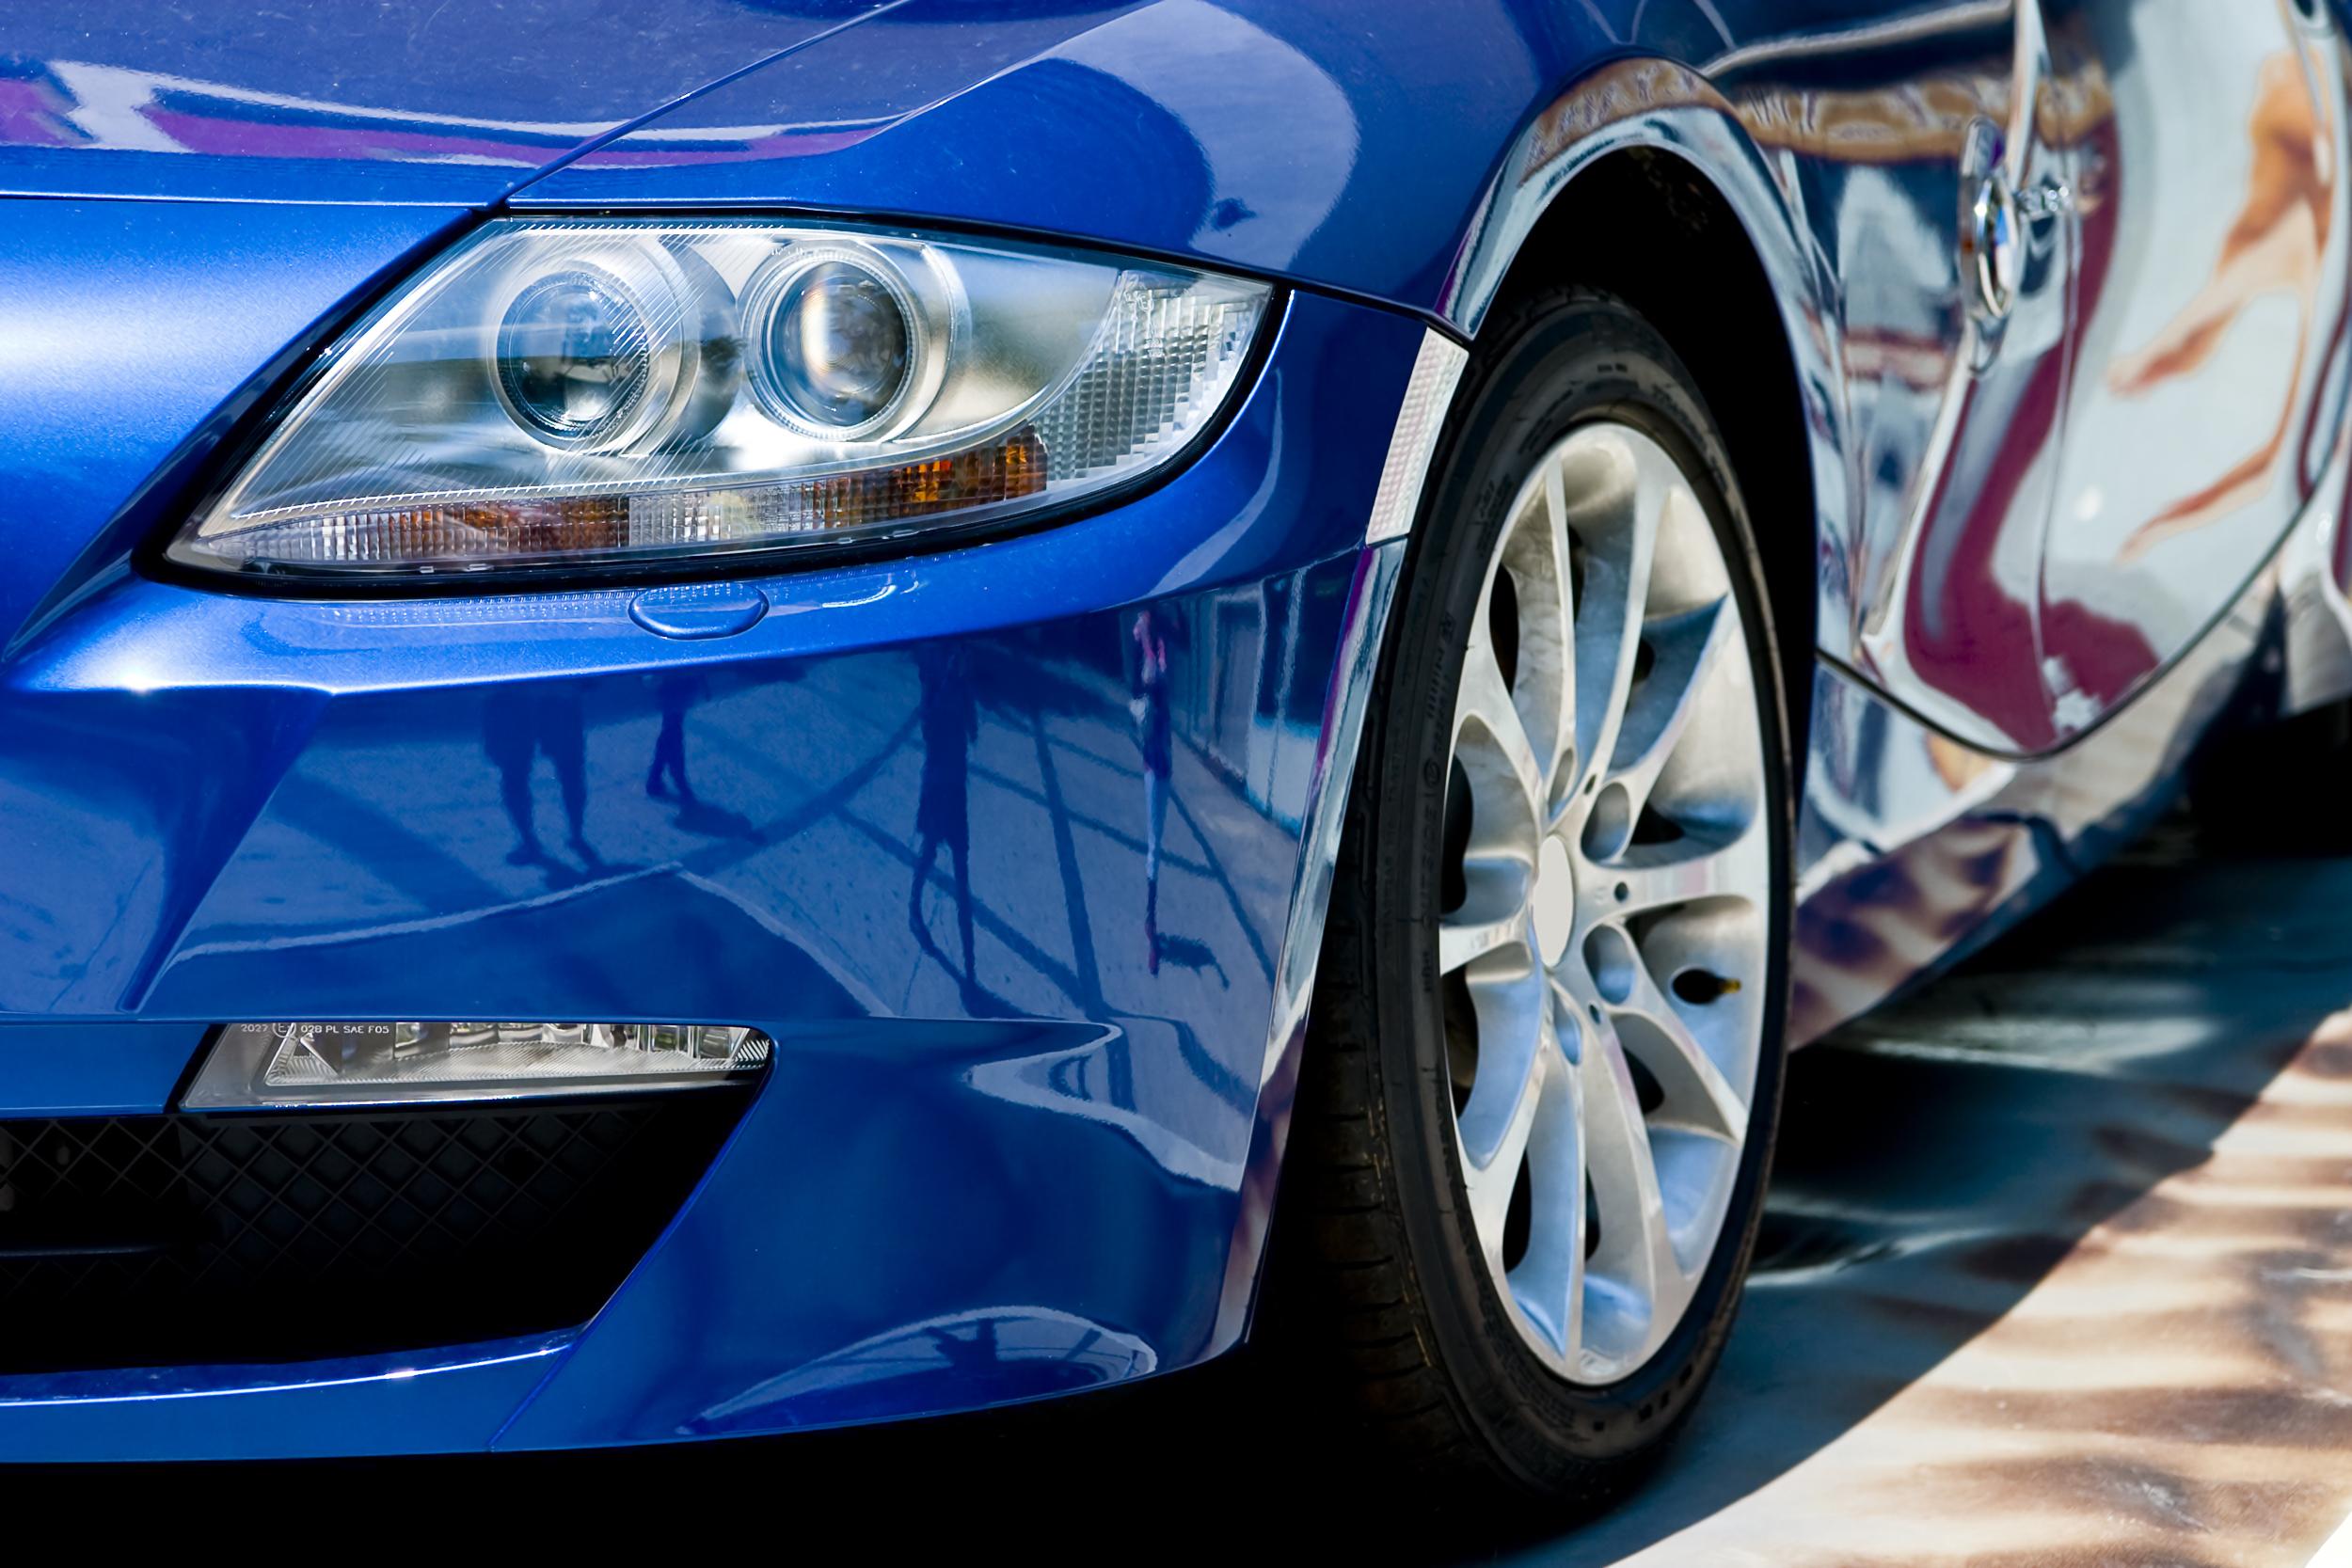 Blue Car Parked-Focus on Headlight